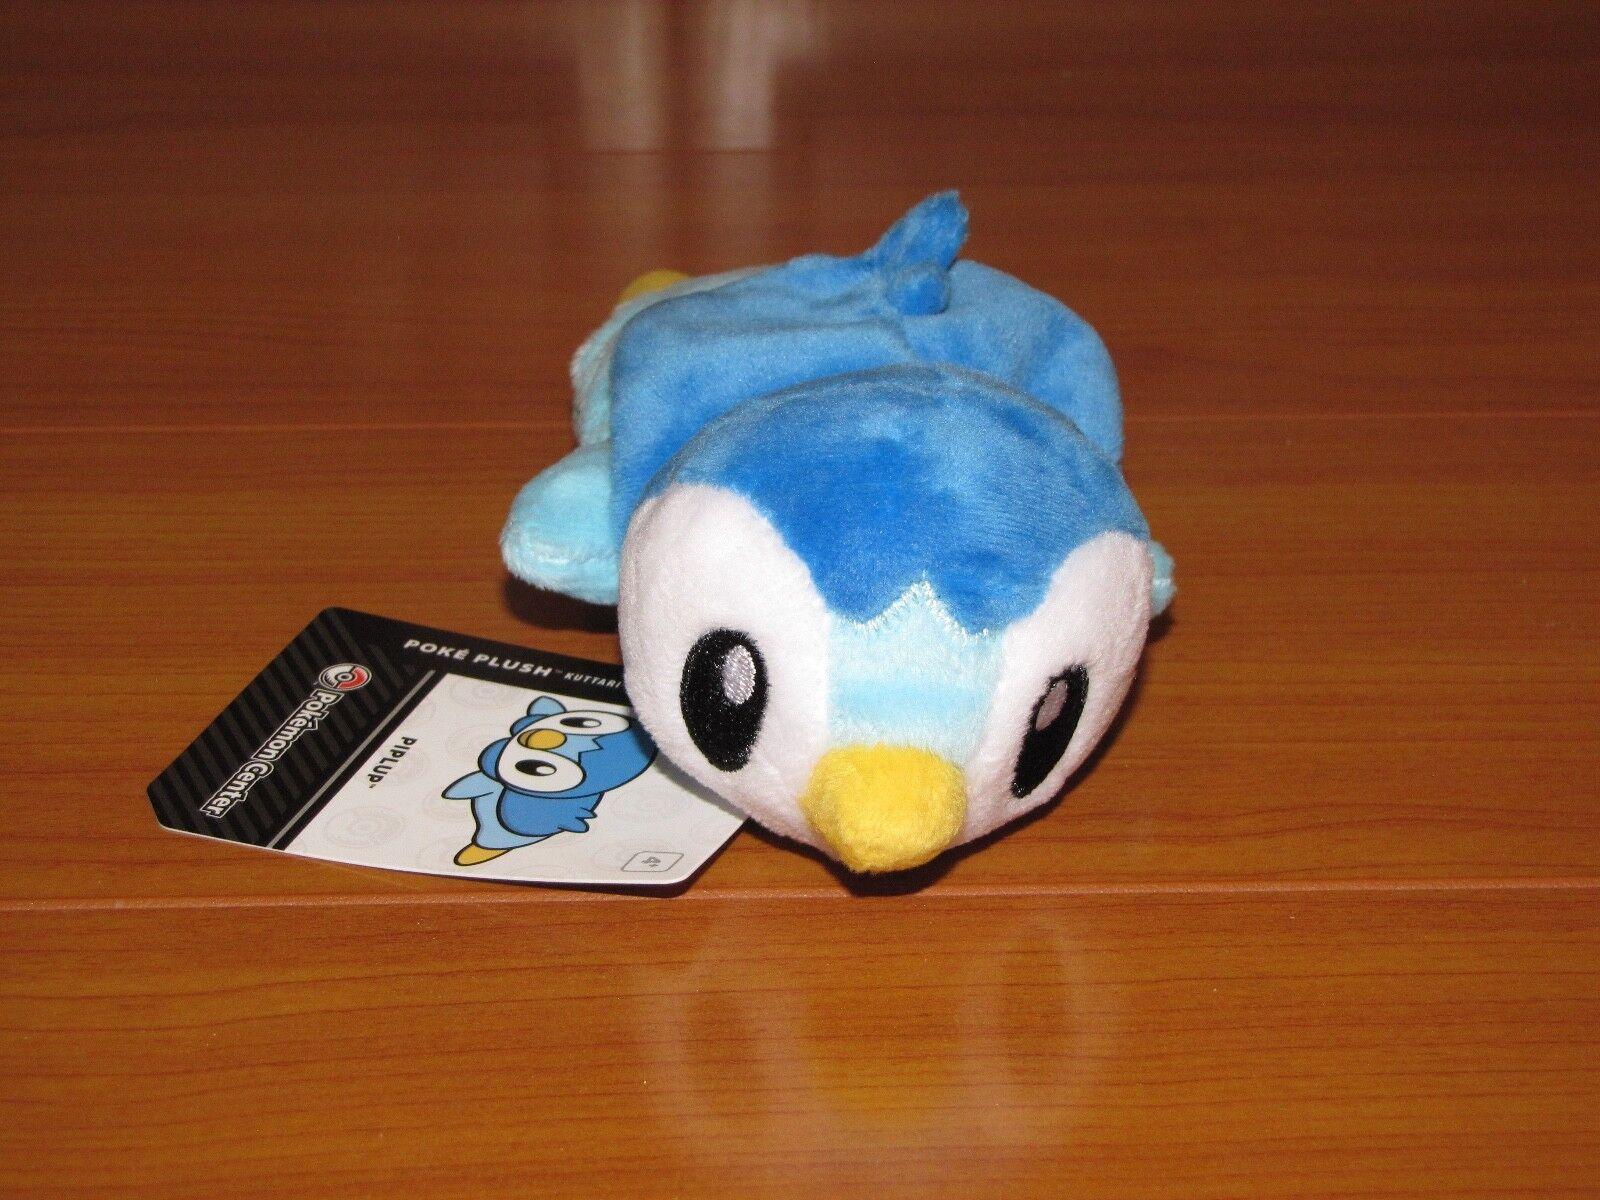 Awake PIPLUP Penguin Pokemon Center Poke Poke Poke Plush Kuttari Cutie bean bag doll NEW 04e53d